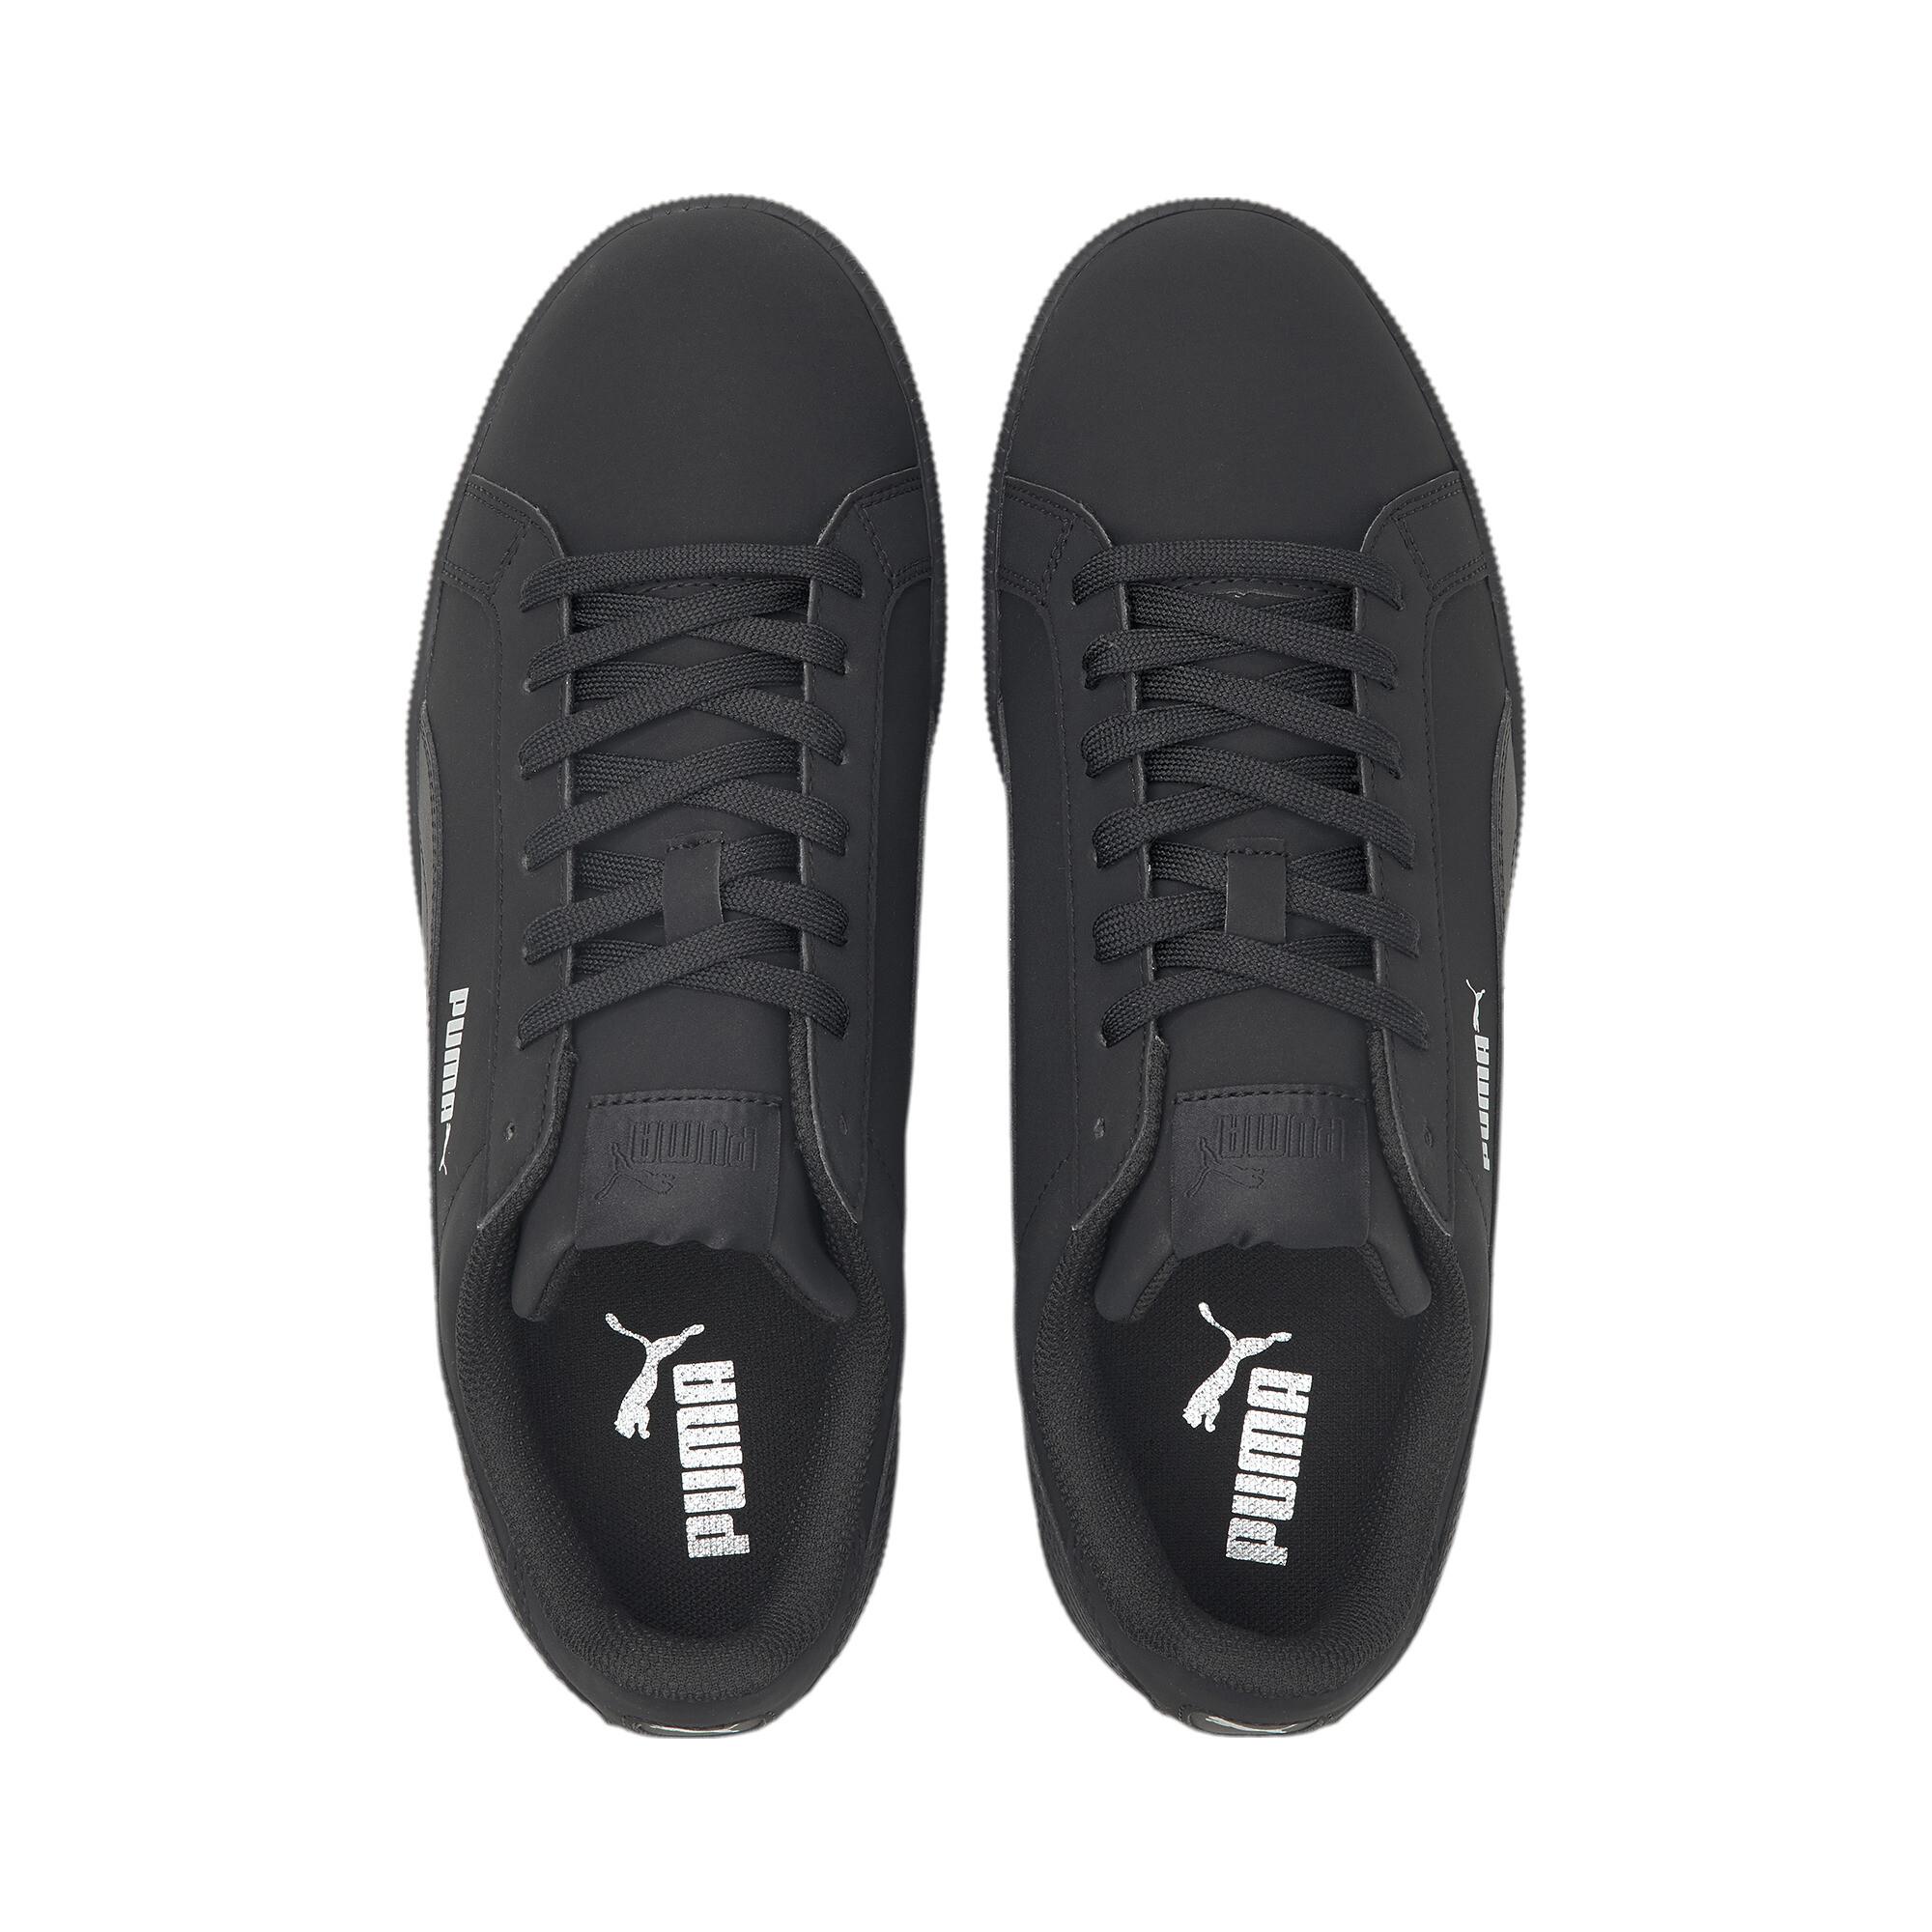 Indexbild 23 - PUMA Smash Buck Sneaker Unisex Schuhe Sport Classics Neu